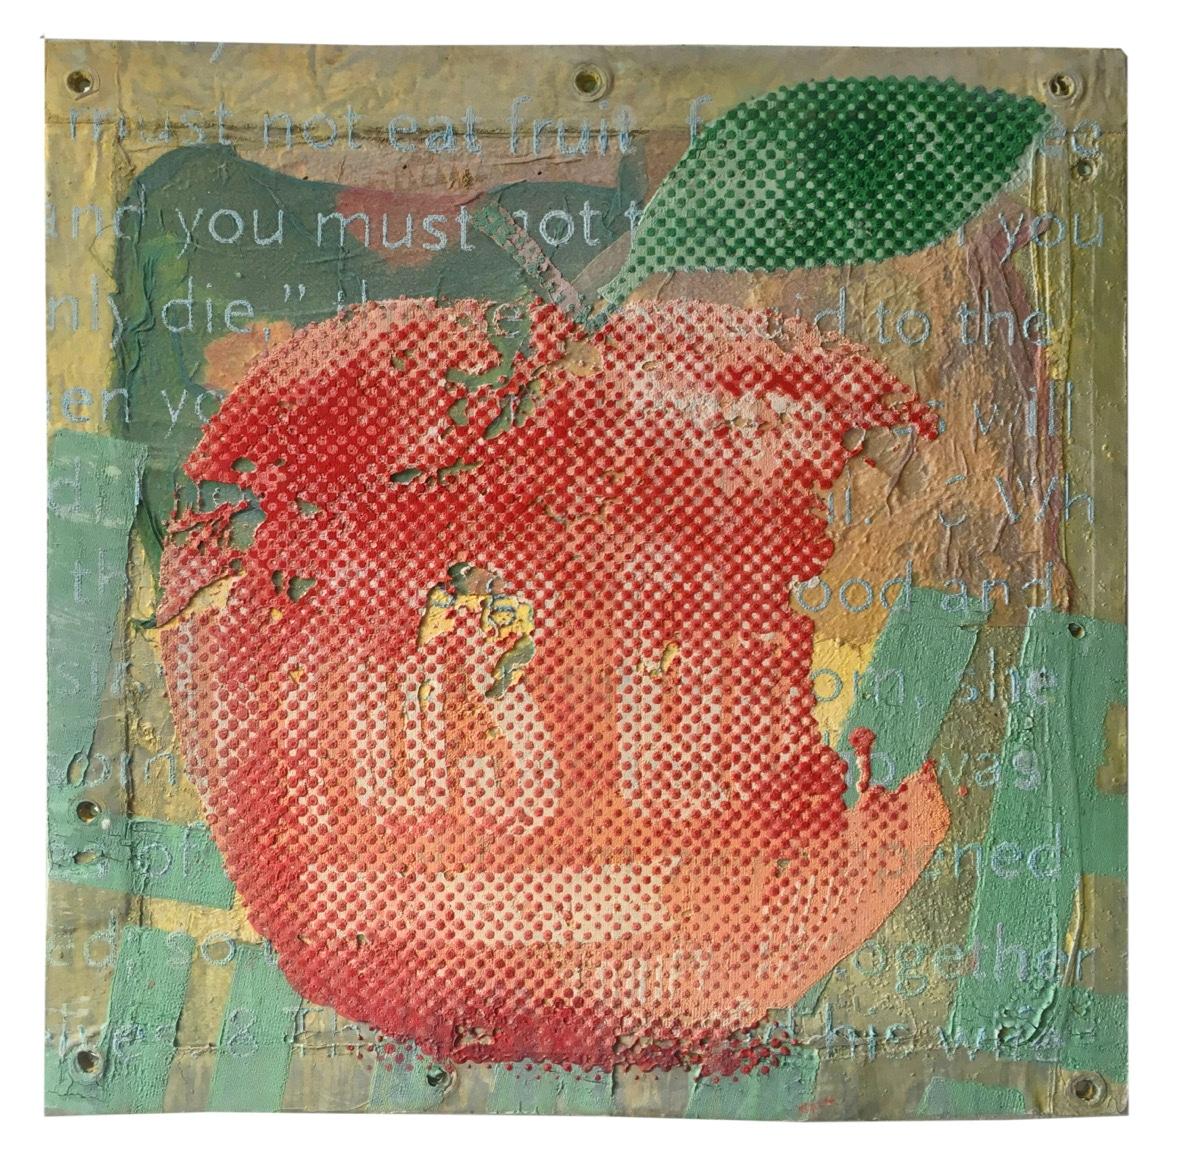 The red forbidden fruit – apple   2019, 50x50cm